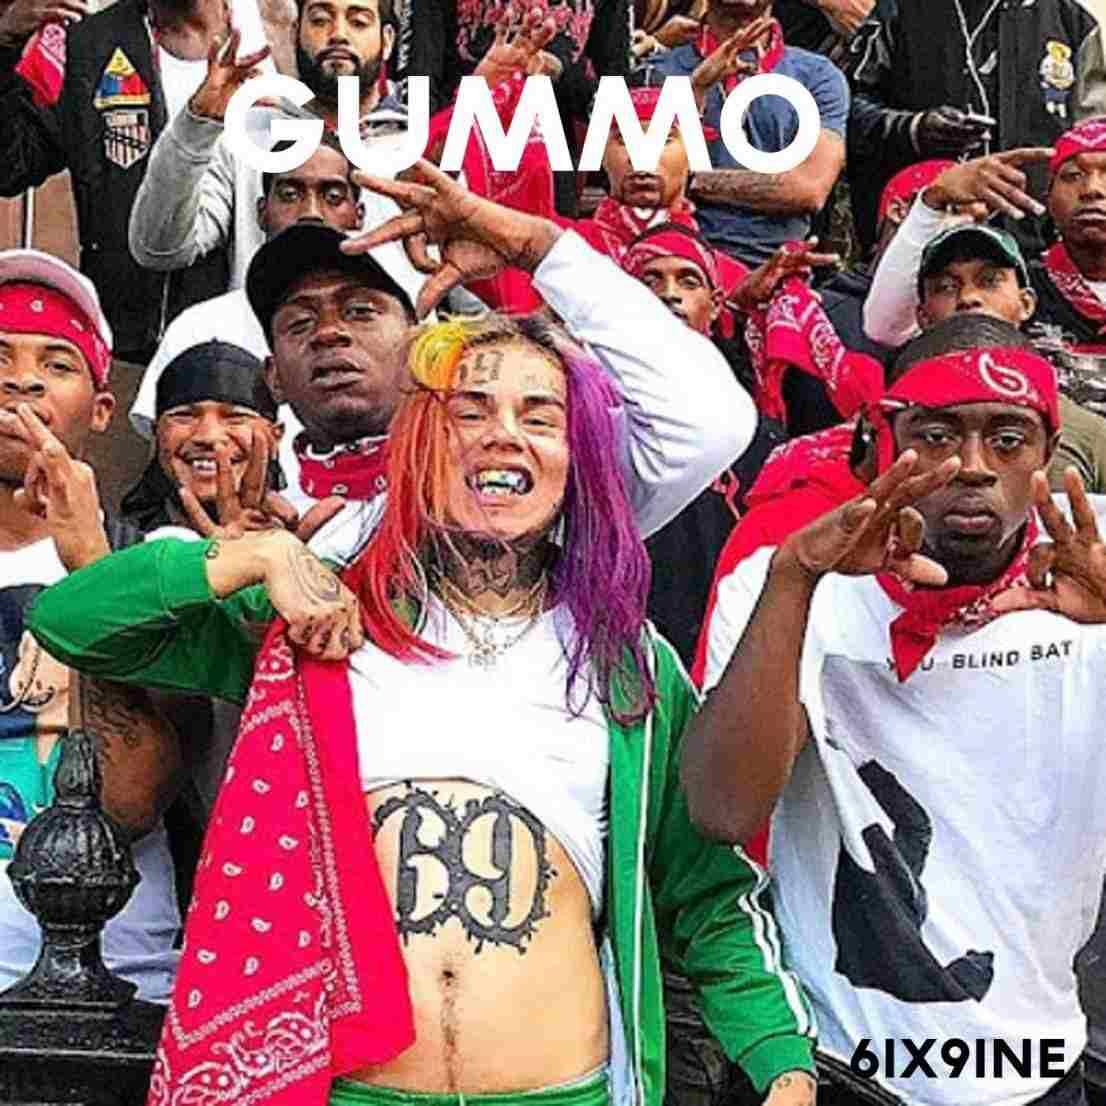 Free Download 69 Rapper Gummo Imagenes8info Imagenes8info 1106x1106 For Your Desktop Mobile Tablet Explore 24 69 Rapper Wallpapers 69 Rapper Wallpapers Rapper Wallpaper 69 Chevelle Wallpaper